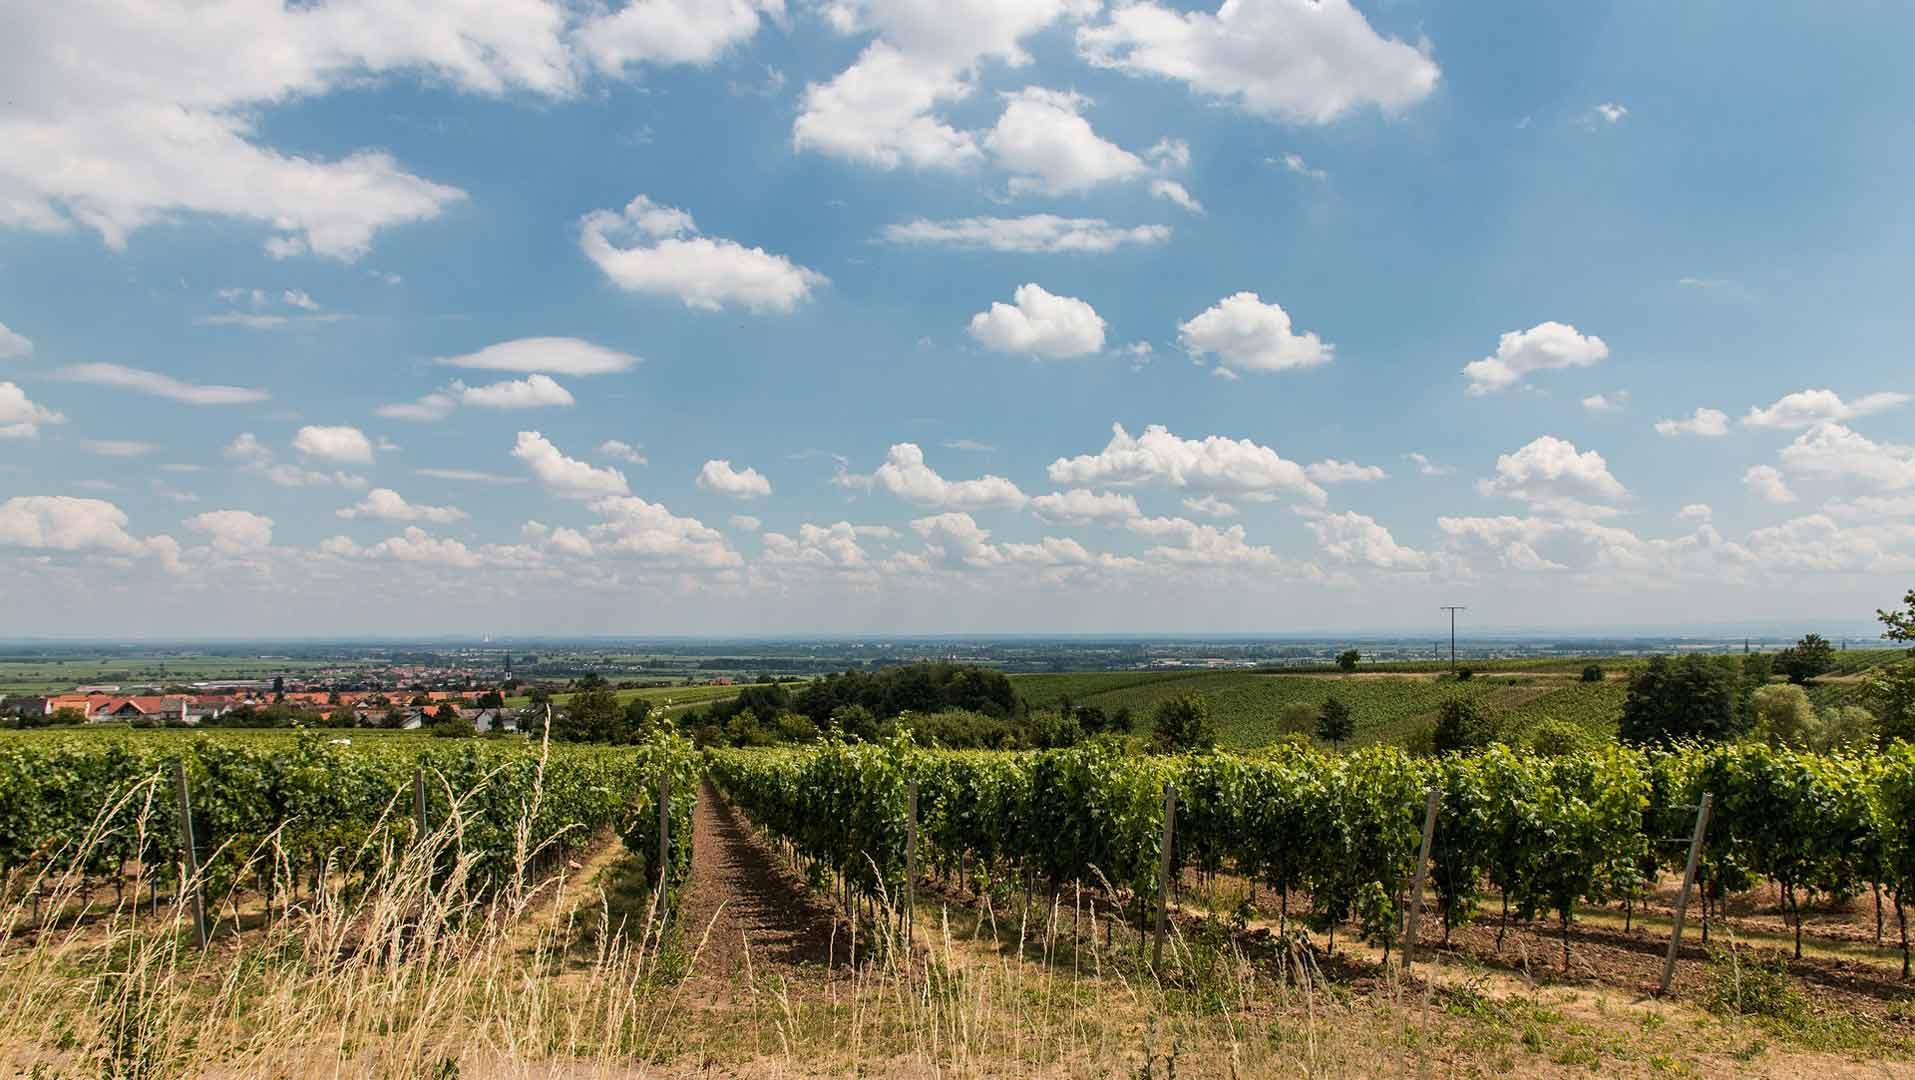 De wijnbergen rondom Maikammer in de Pfalz.